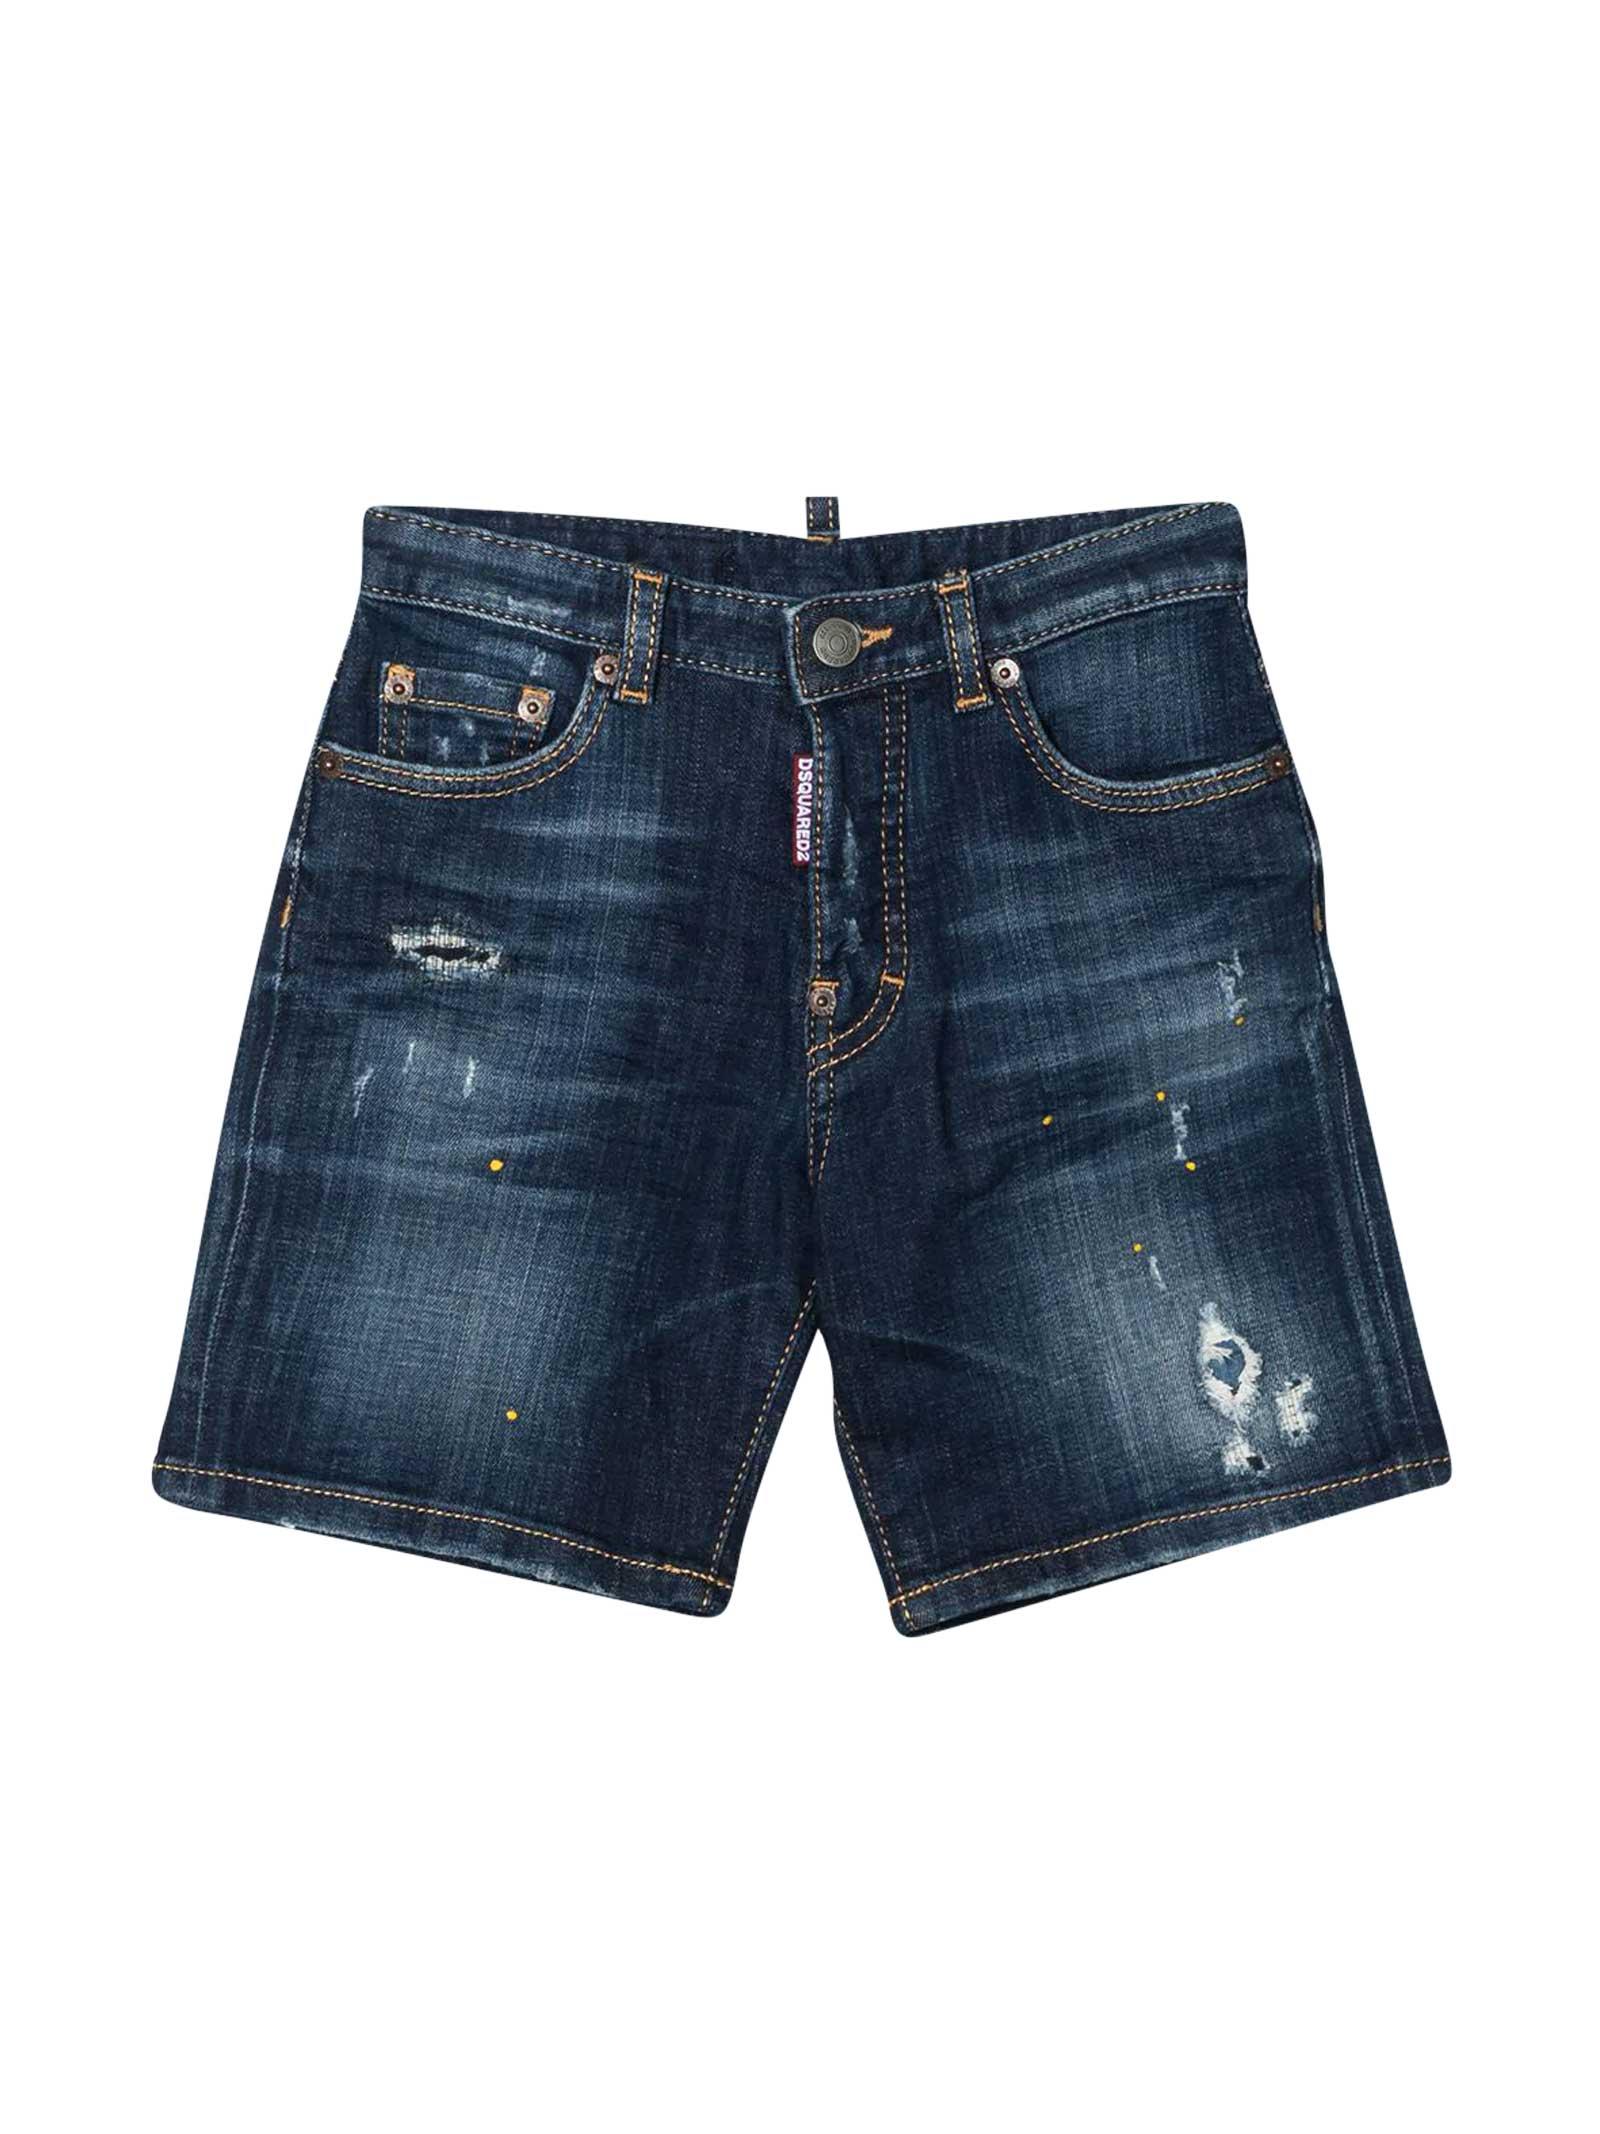 Dsquared2 Shorts BLUE DENIM SHORTS